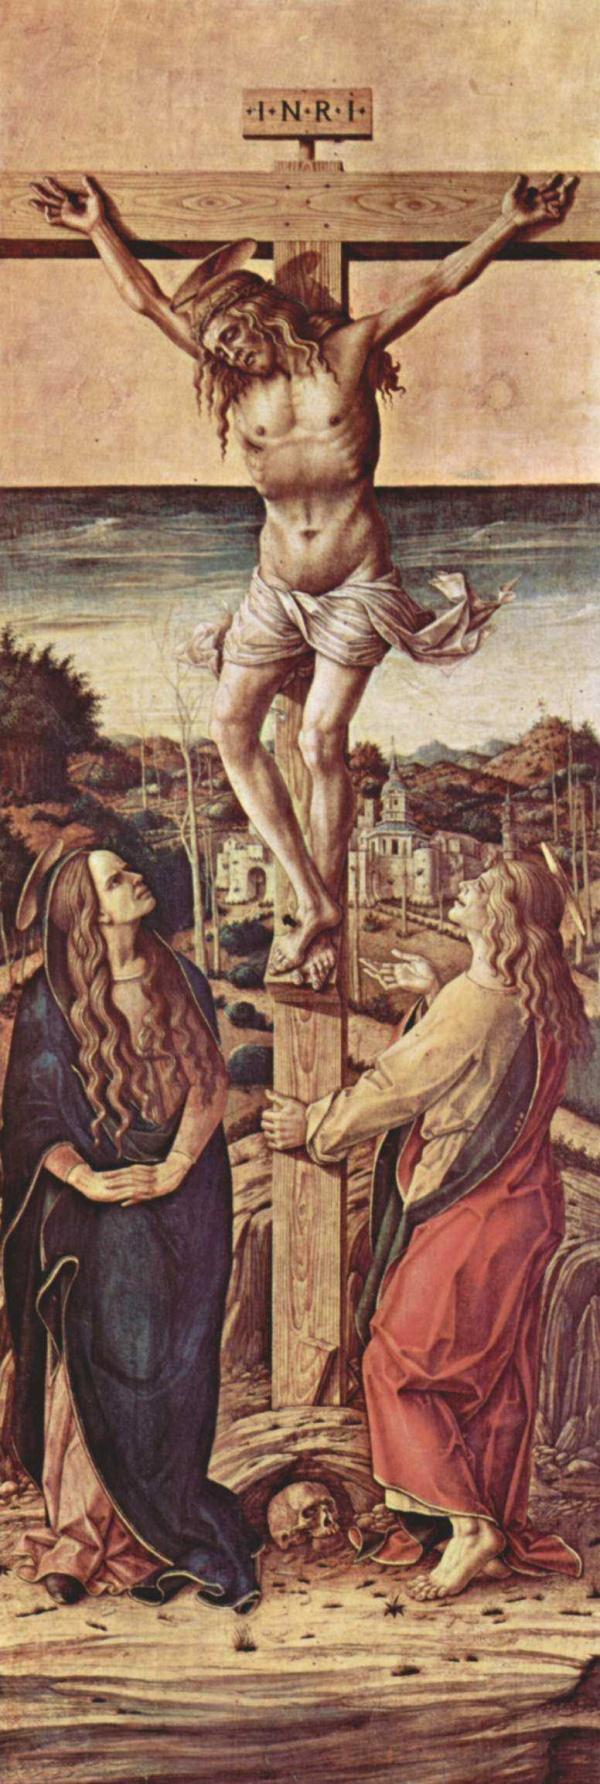 Карло Кривелли — итальянский живописец XV века (185 фото)